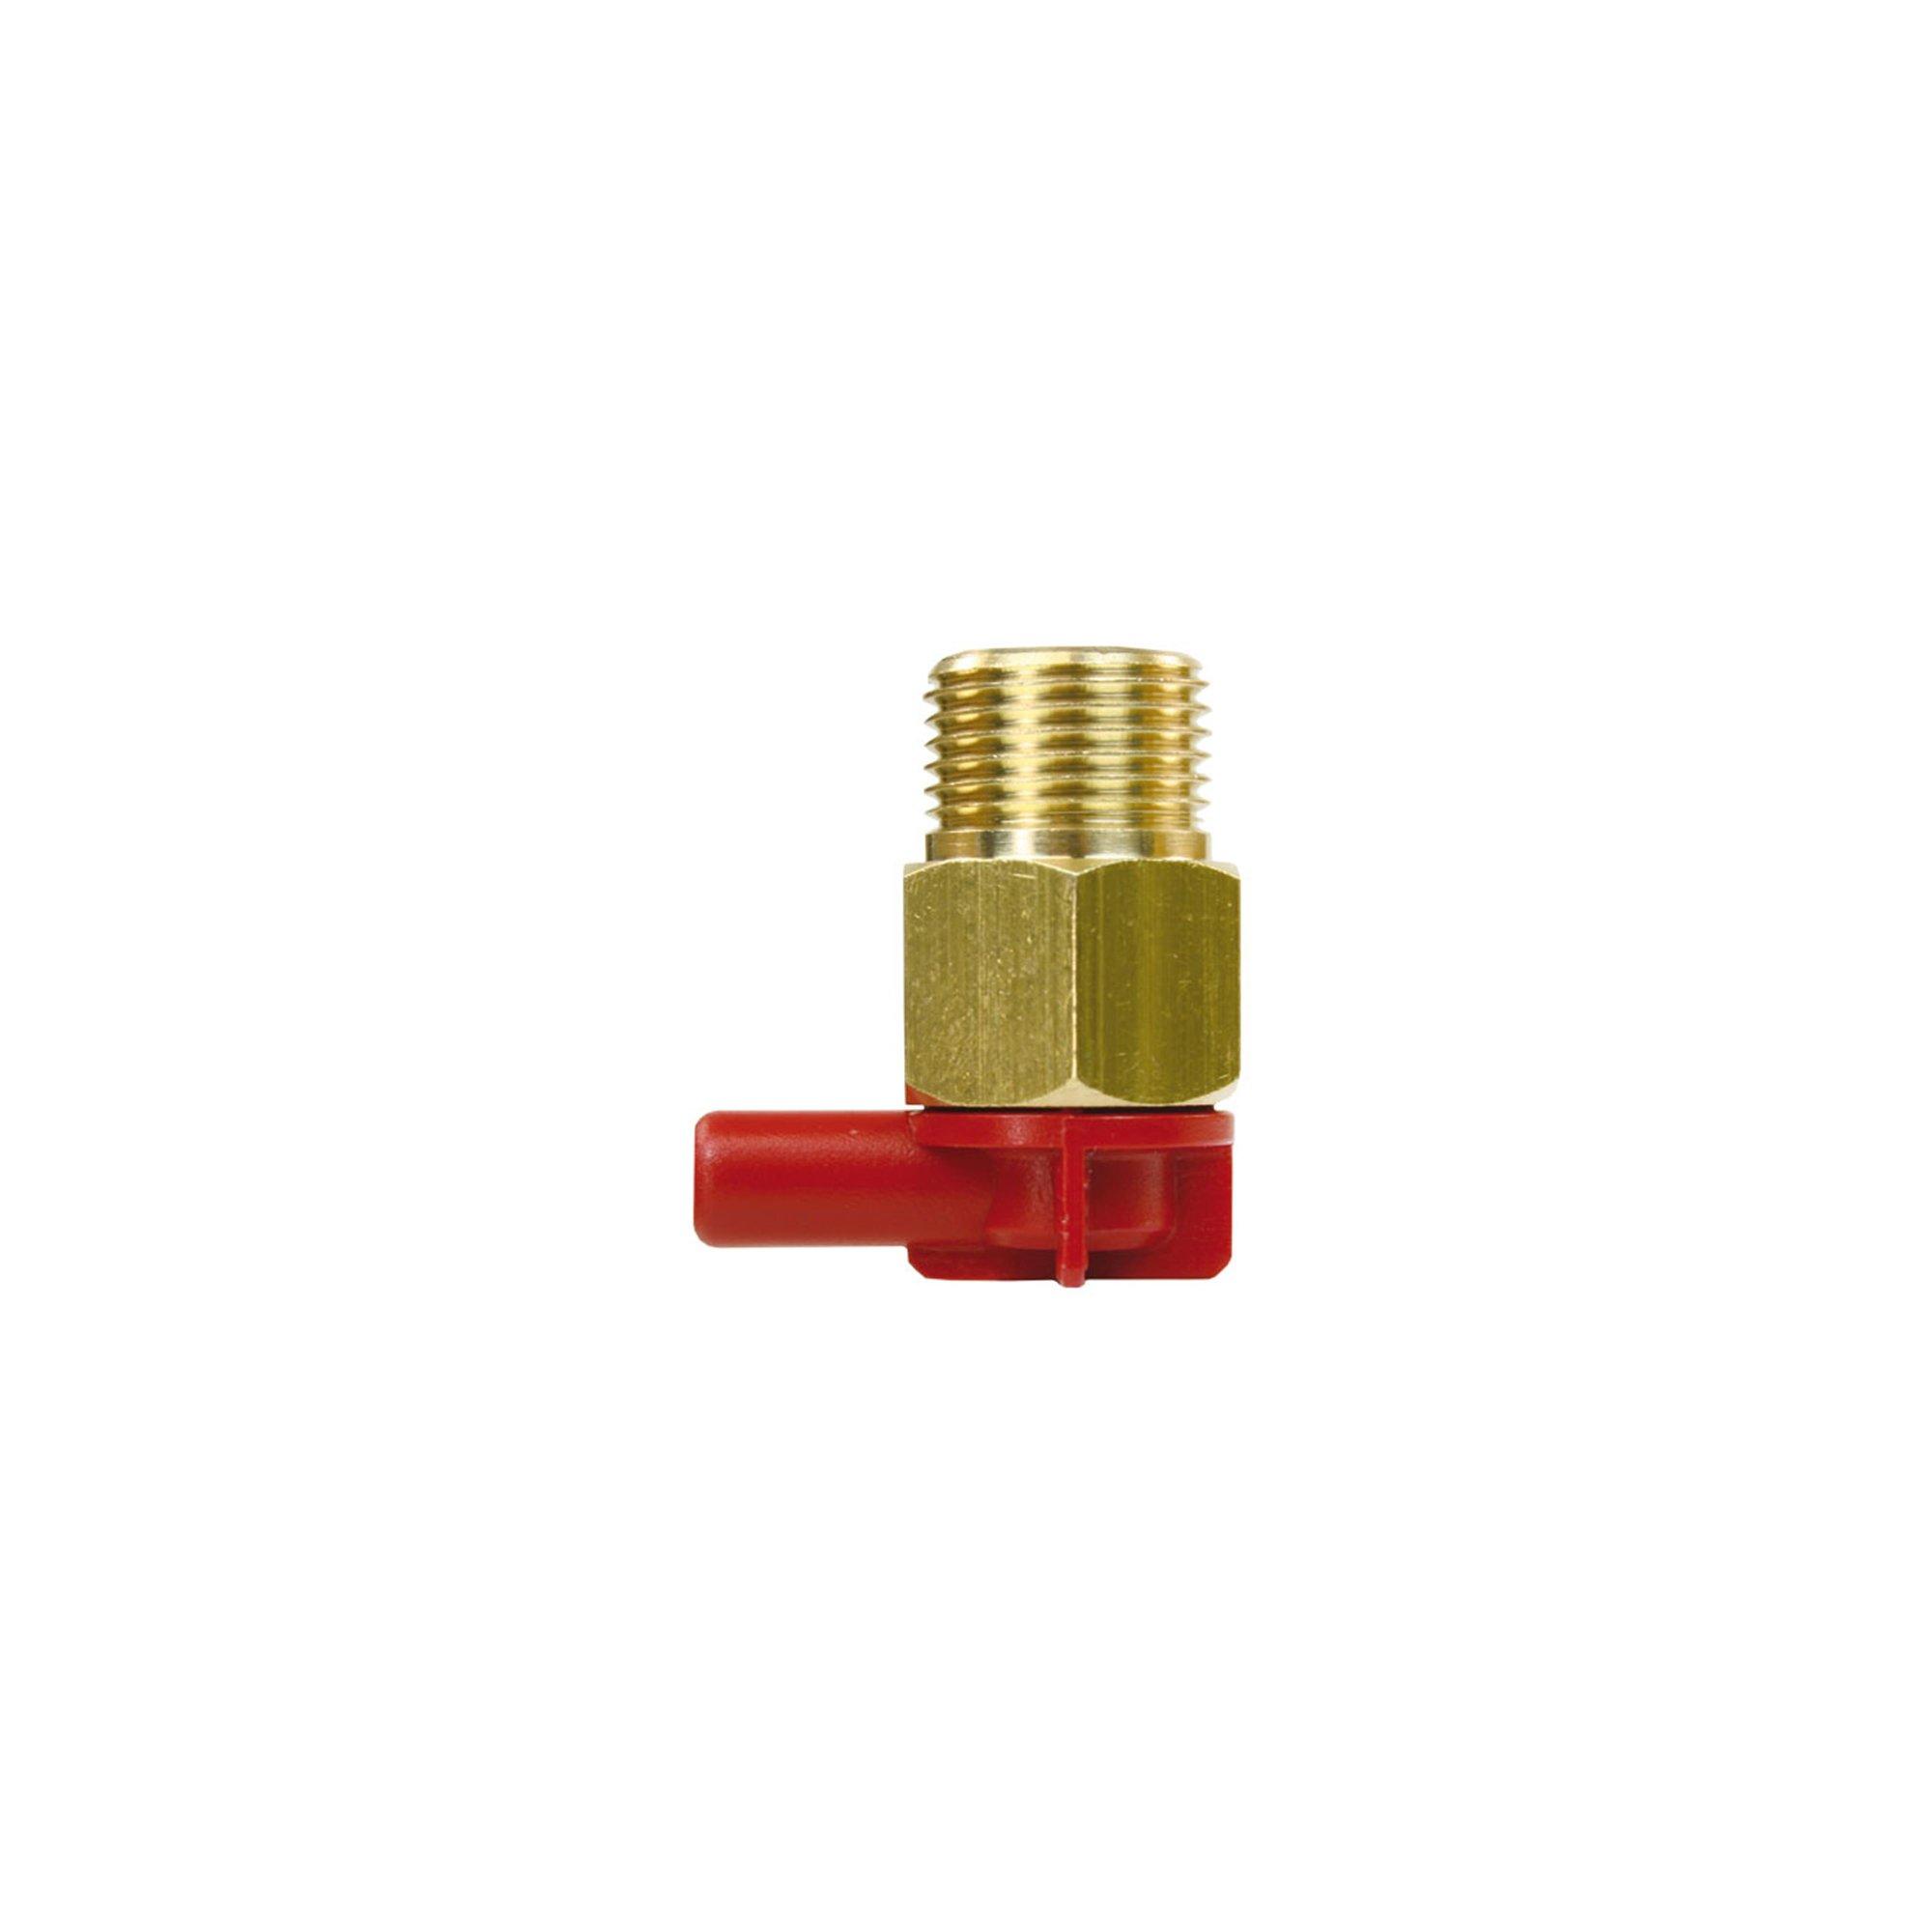 "R+M de Wit Thermoventil mit Fühler aus Kupfer, 3/8"" AG - Tülle 6mm, Betriebstemperatur 63°C, max. 10 bar, Thermoventil 3/8 63 C°"